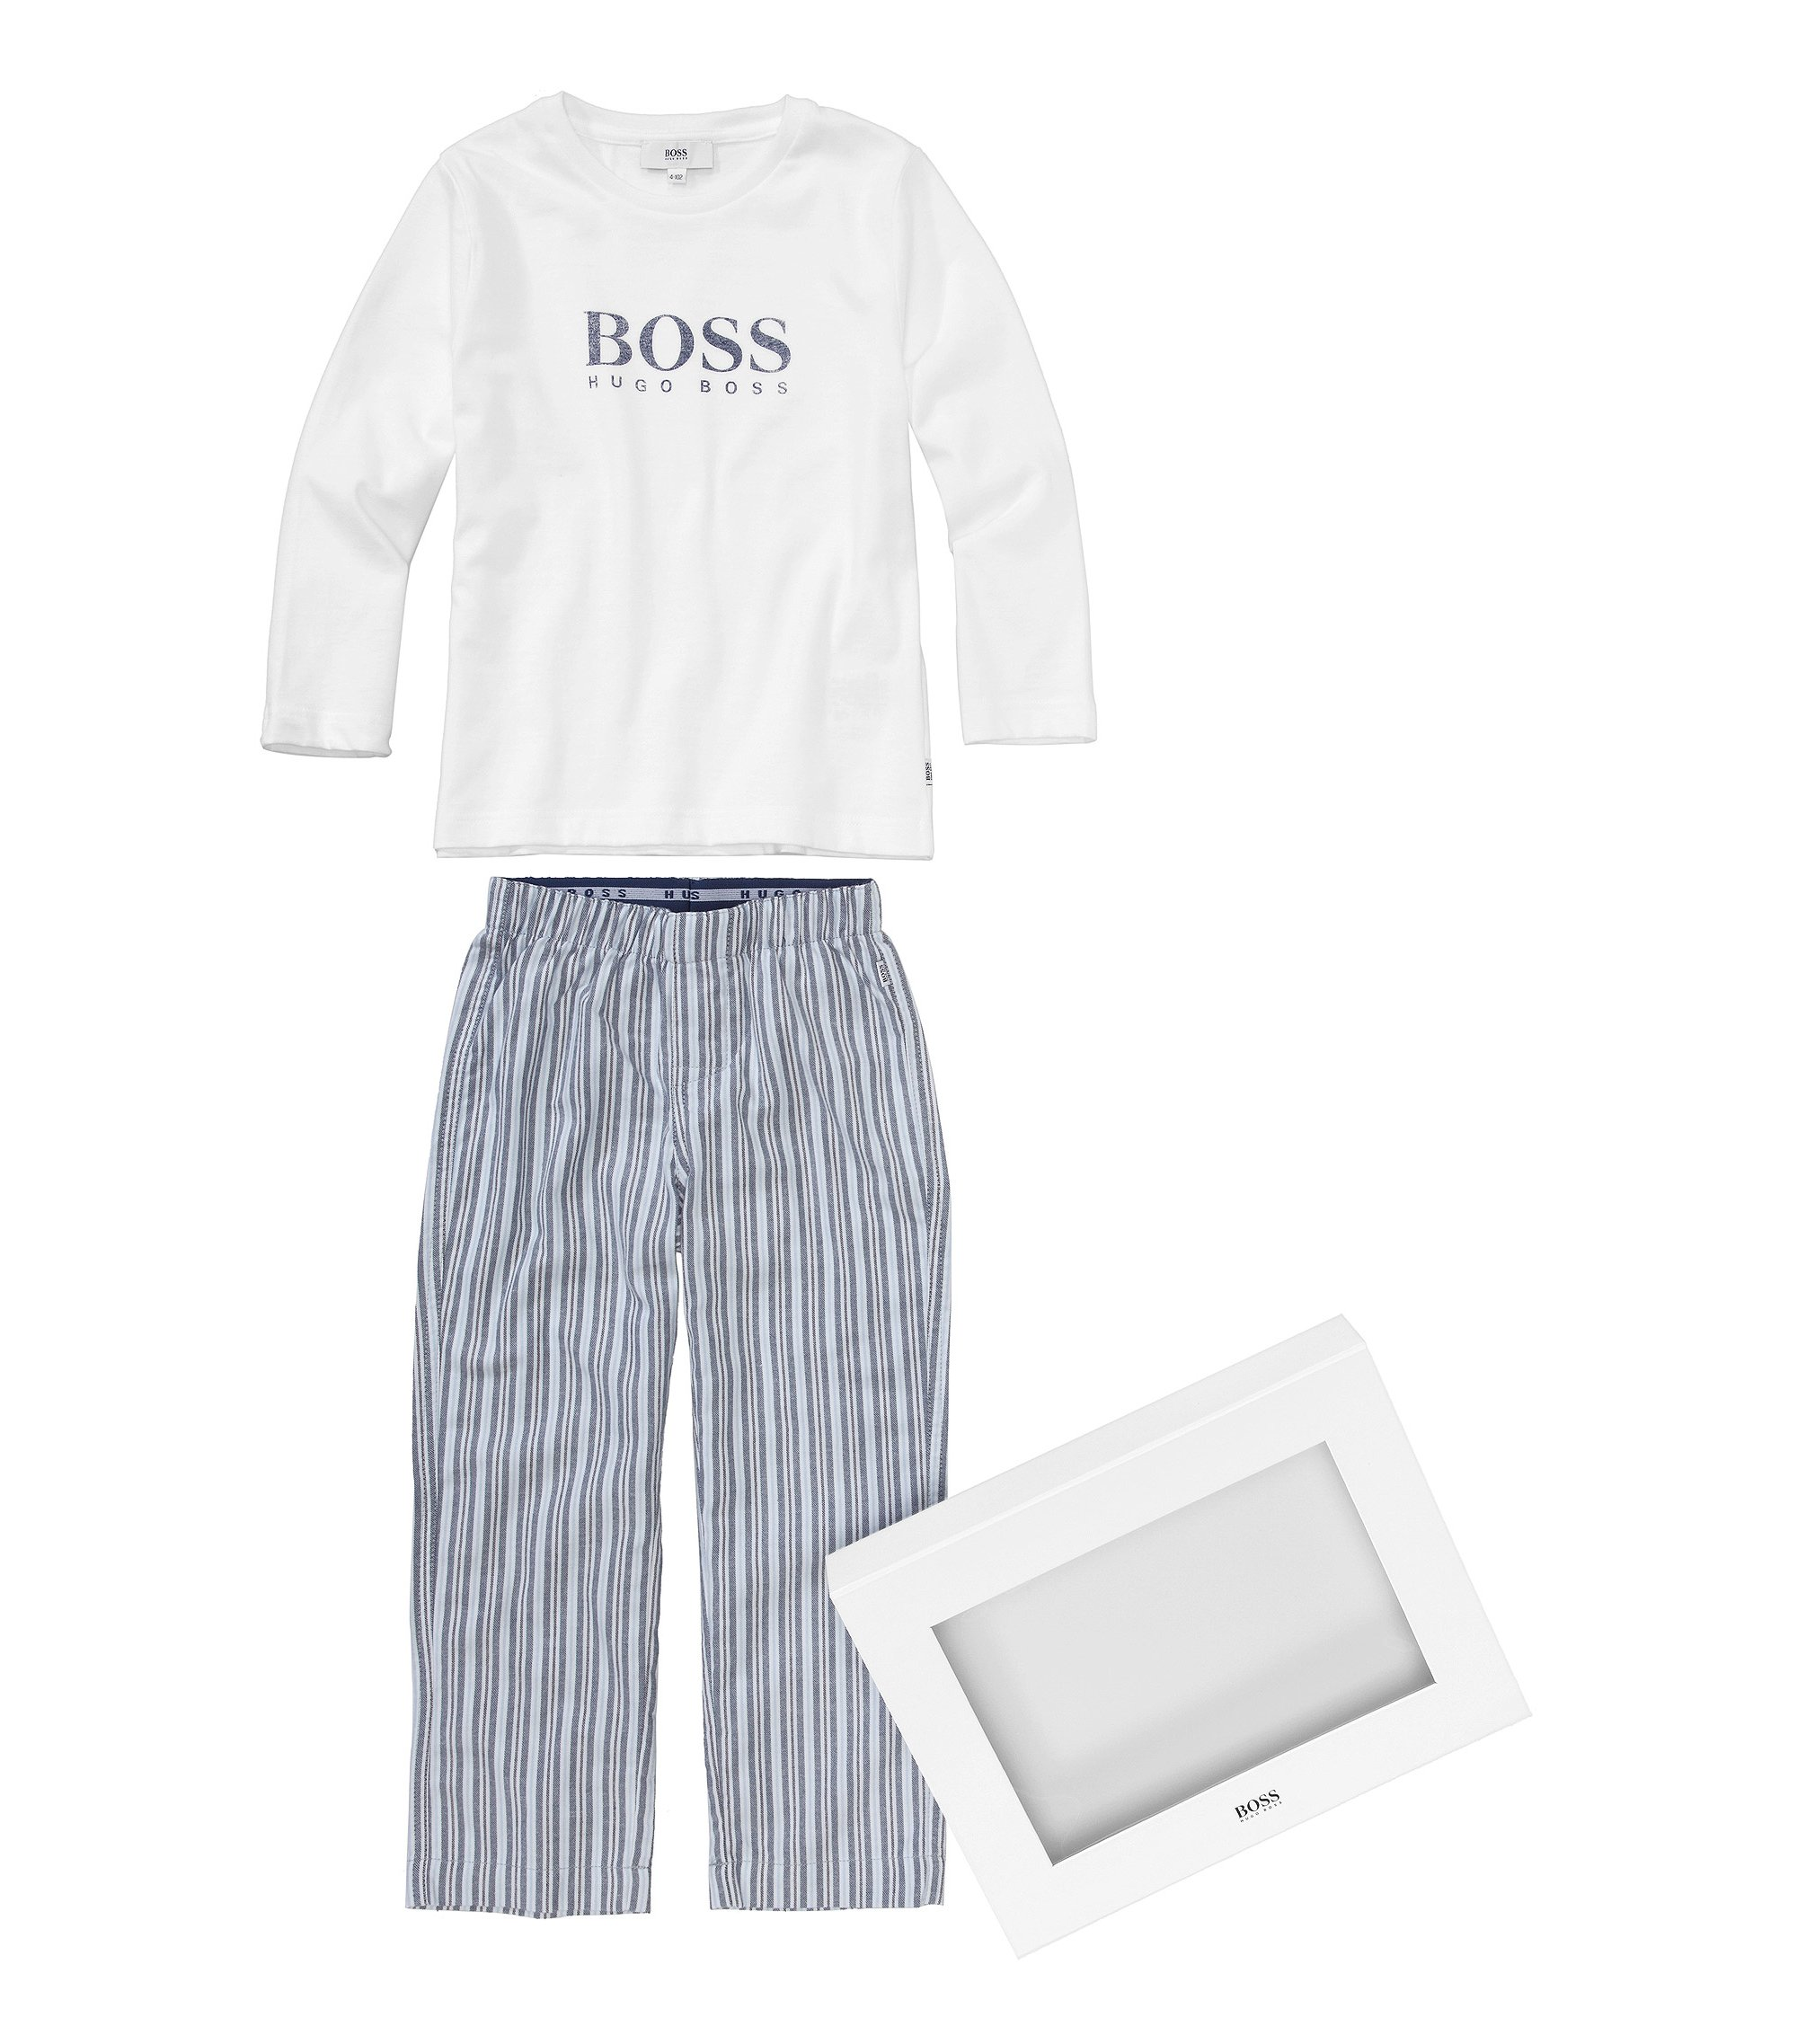 Pyjama pour enfant «J2K032» en coton, Blanc